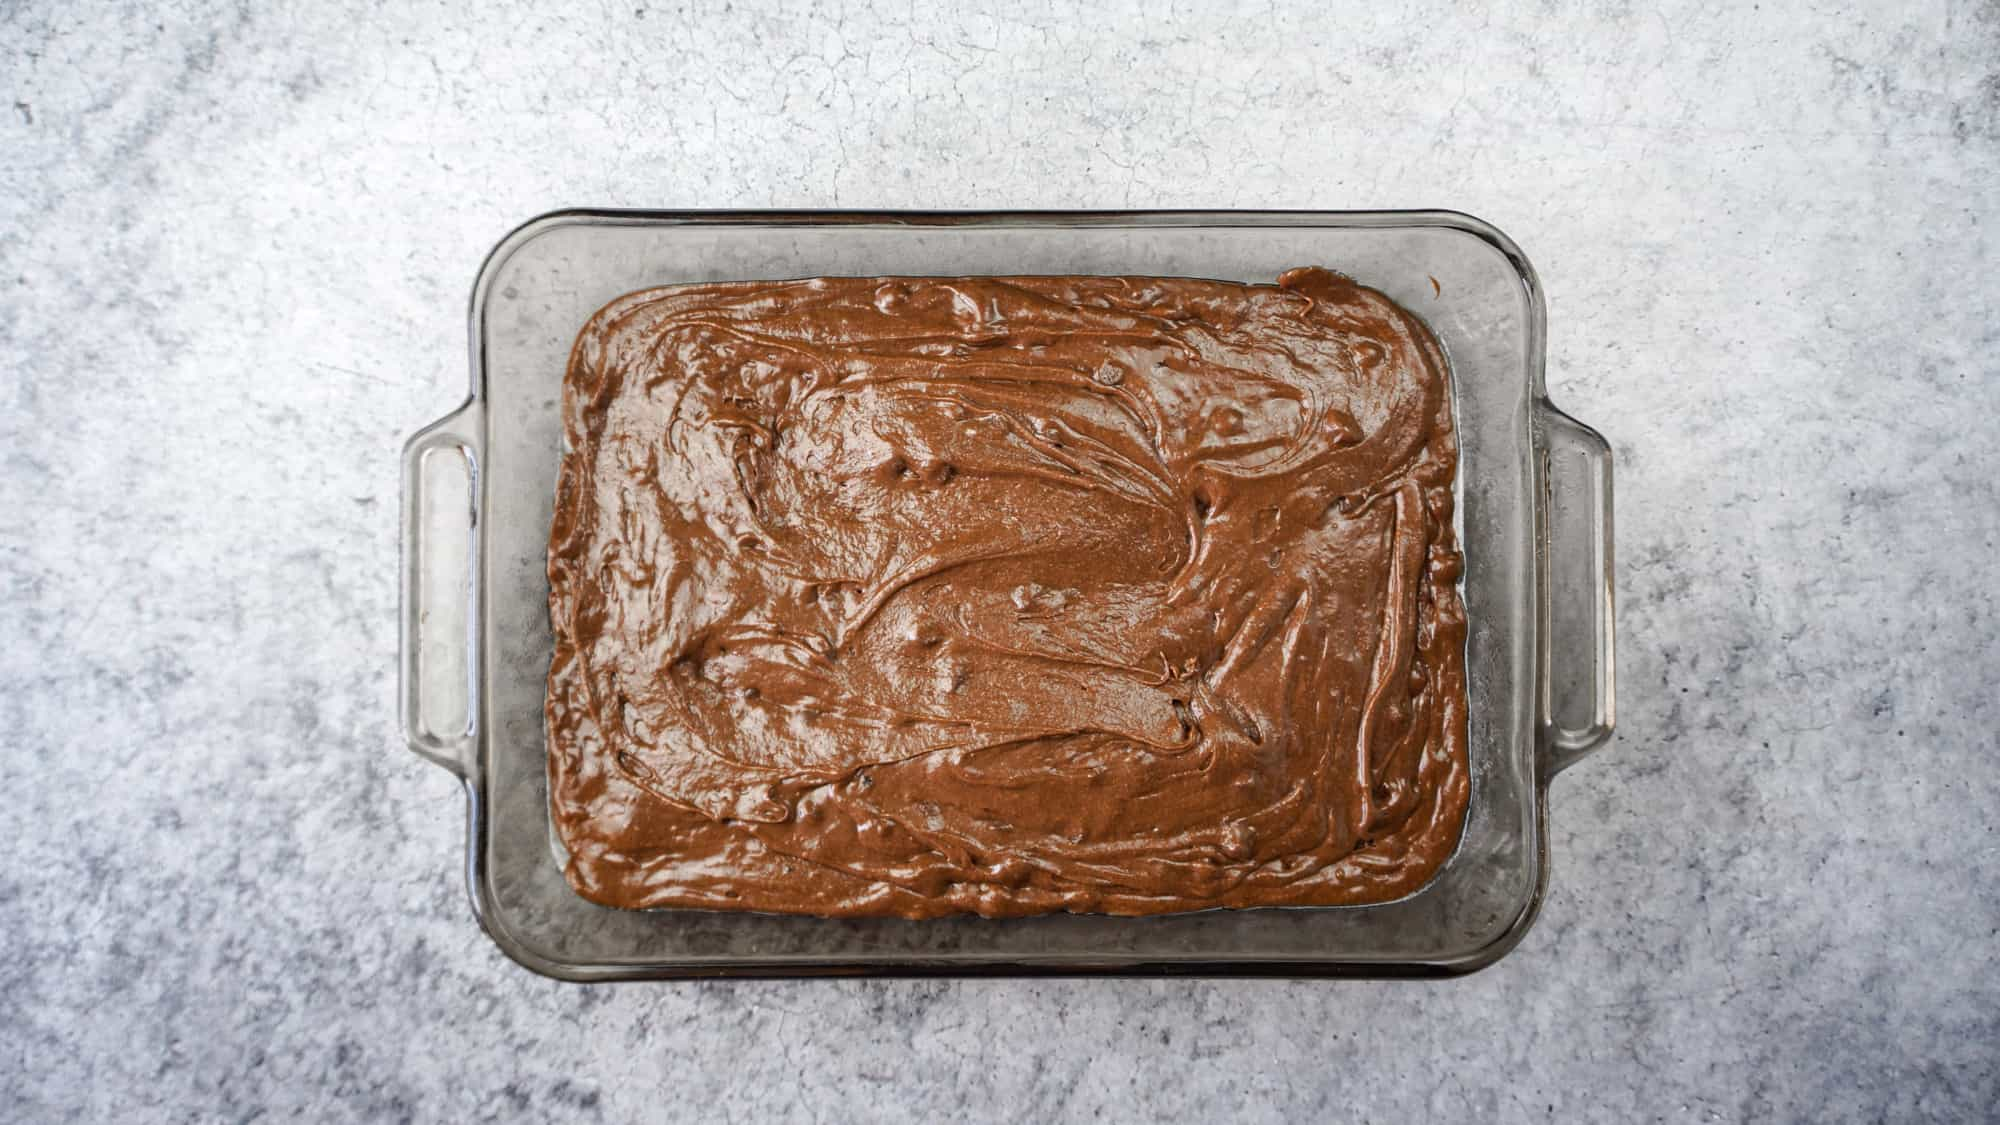 brownie batter in baking dish before baking